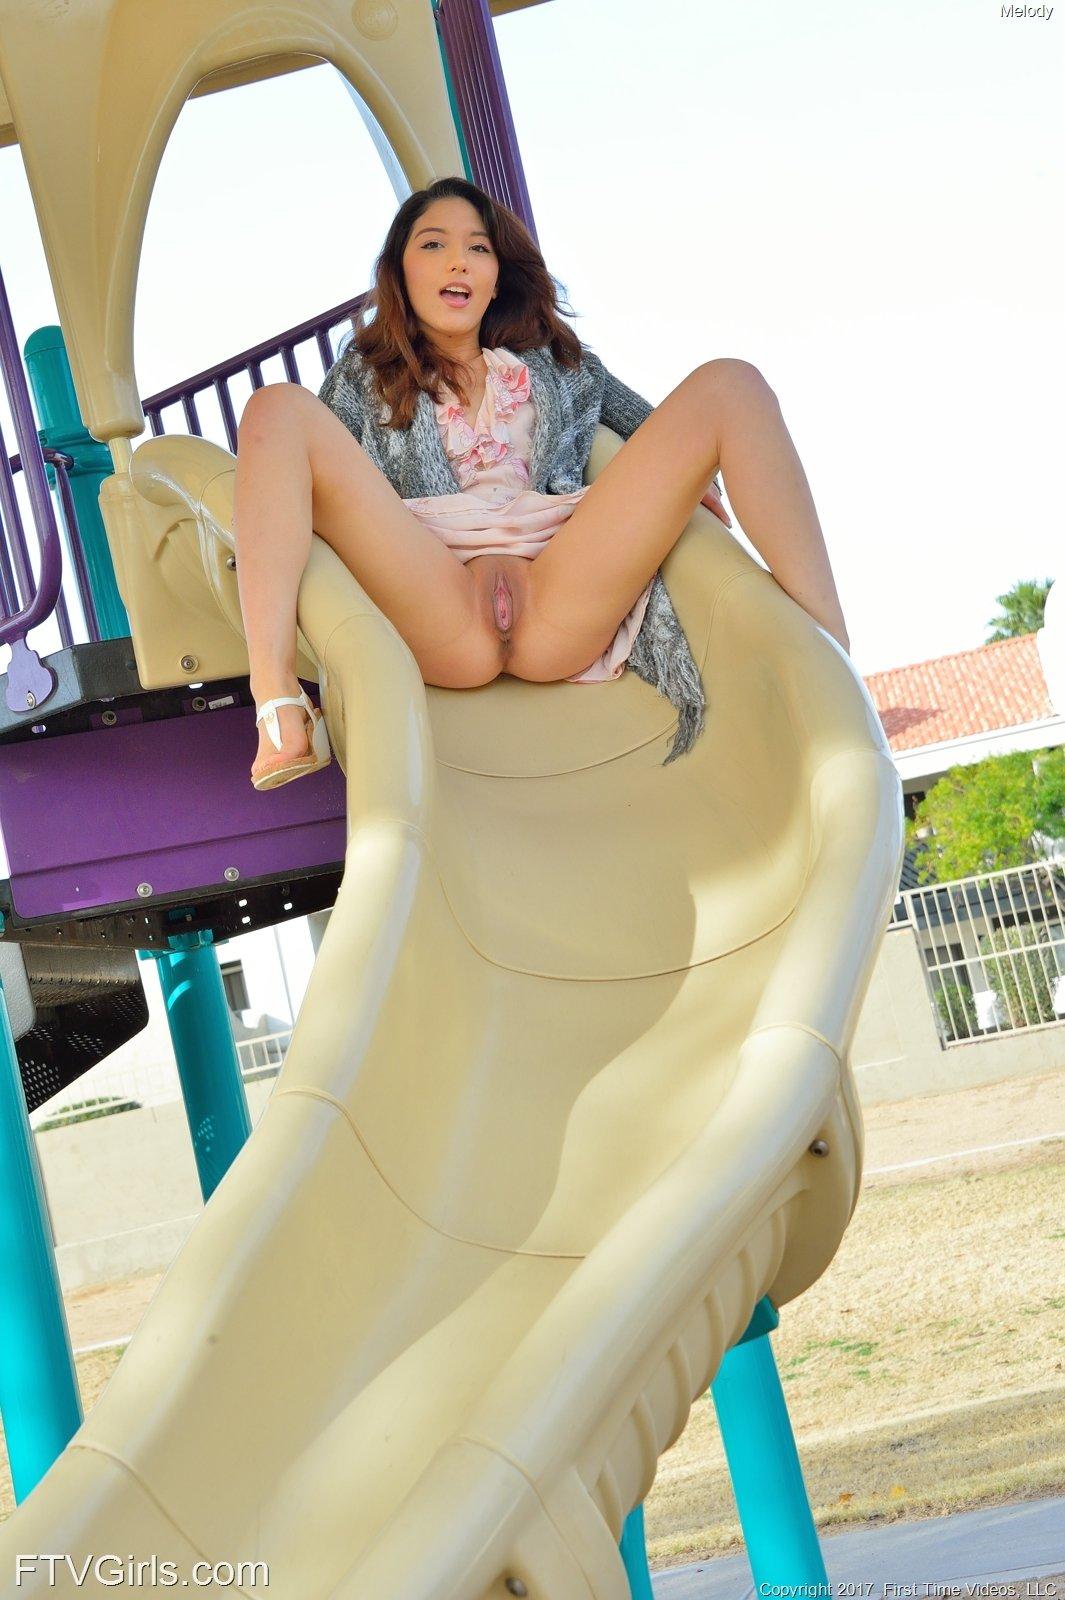 https://cdn.eroticbeauties.net/content/ftvgirls_7532_melody_at-the-playground/full/16.jpg